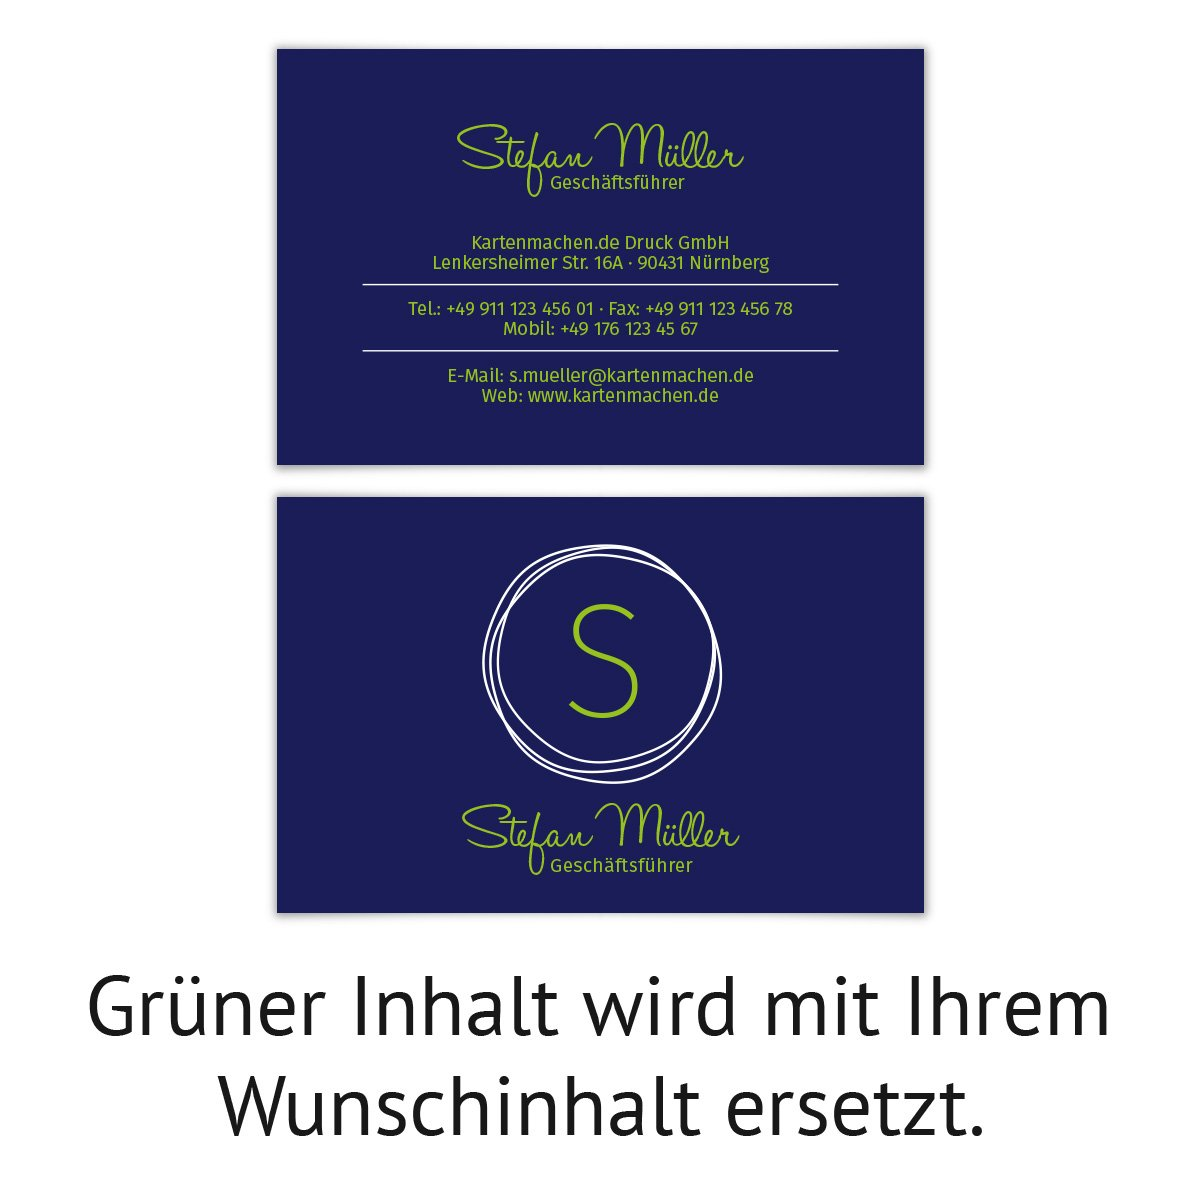 500 x Visitenkarten individuell Business Karten 300g qm qm qm 85 x 55 mm - Kritzellogo B07CHJ591F | Exzellente Verarbeitung  | Große Klassifizierung  | Fein Verarbeitet  942854